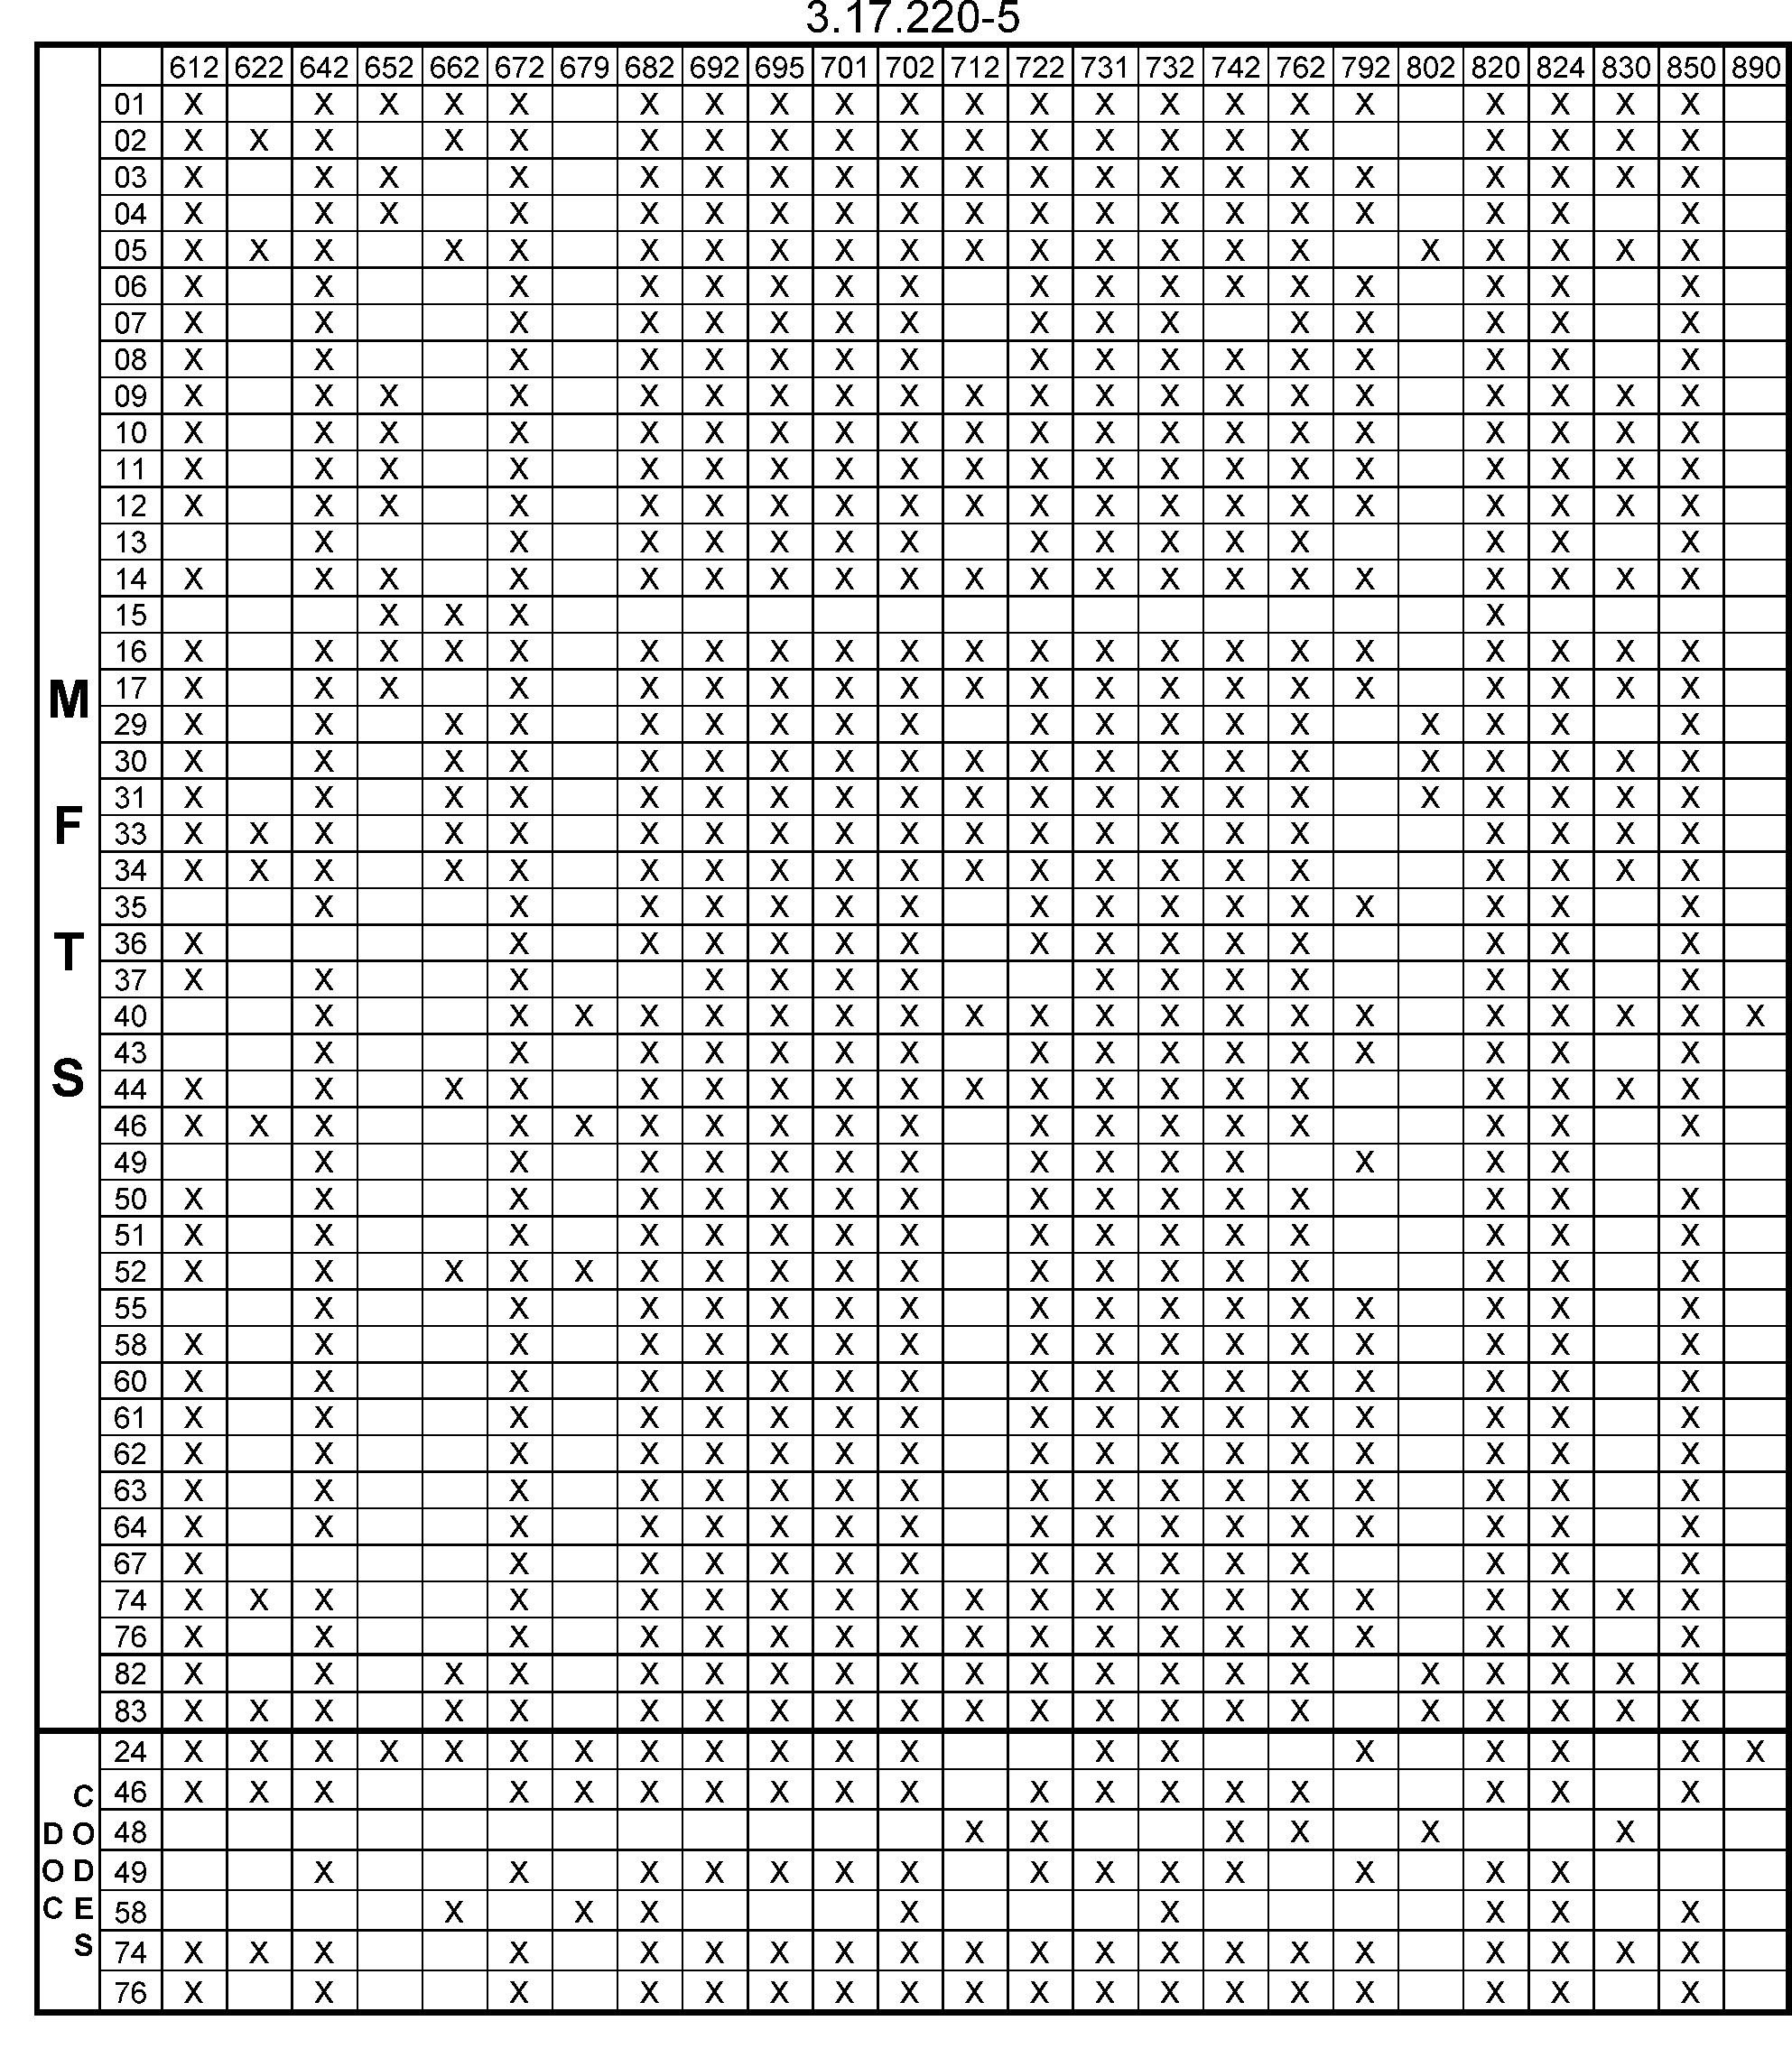 Covalent Bonds Gizmo Worksheet Answers - worksheet